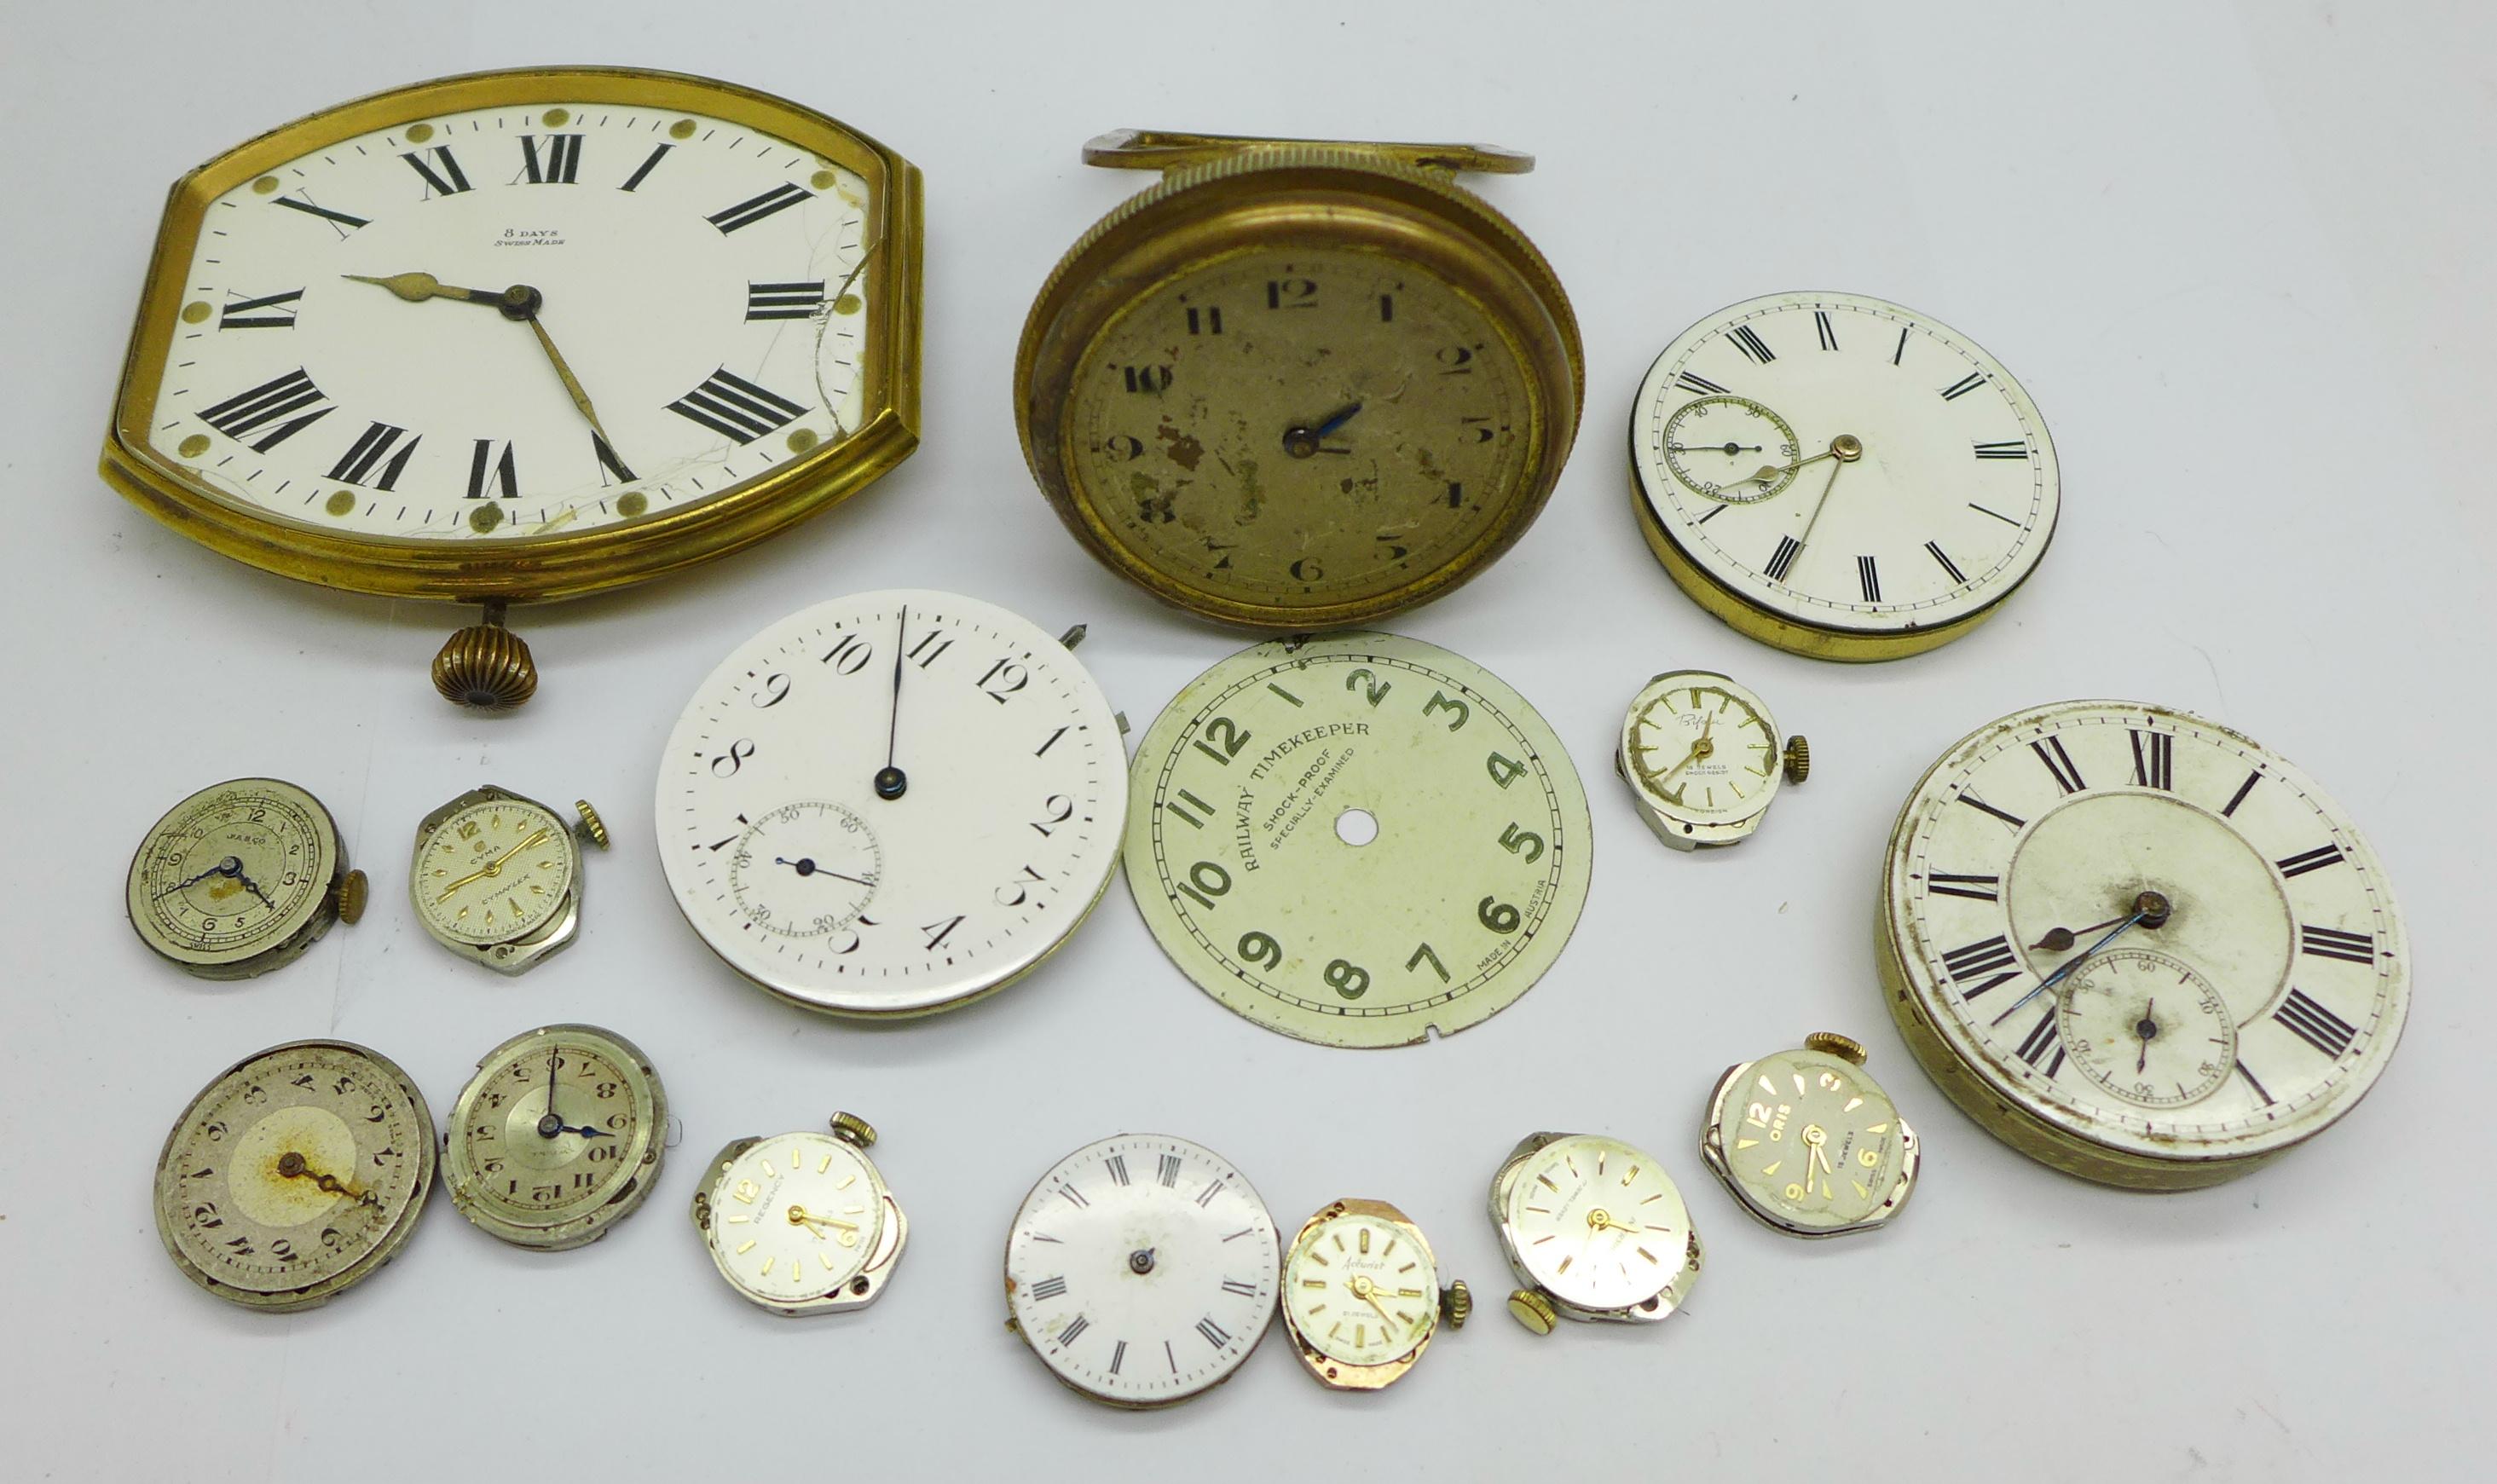 A clock movement, pocket watch movements and wristwatch movements